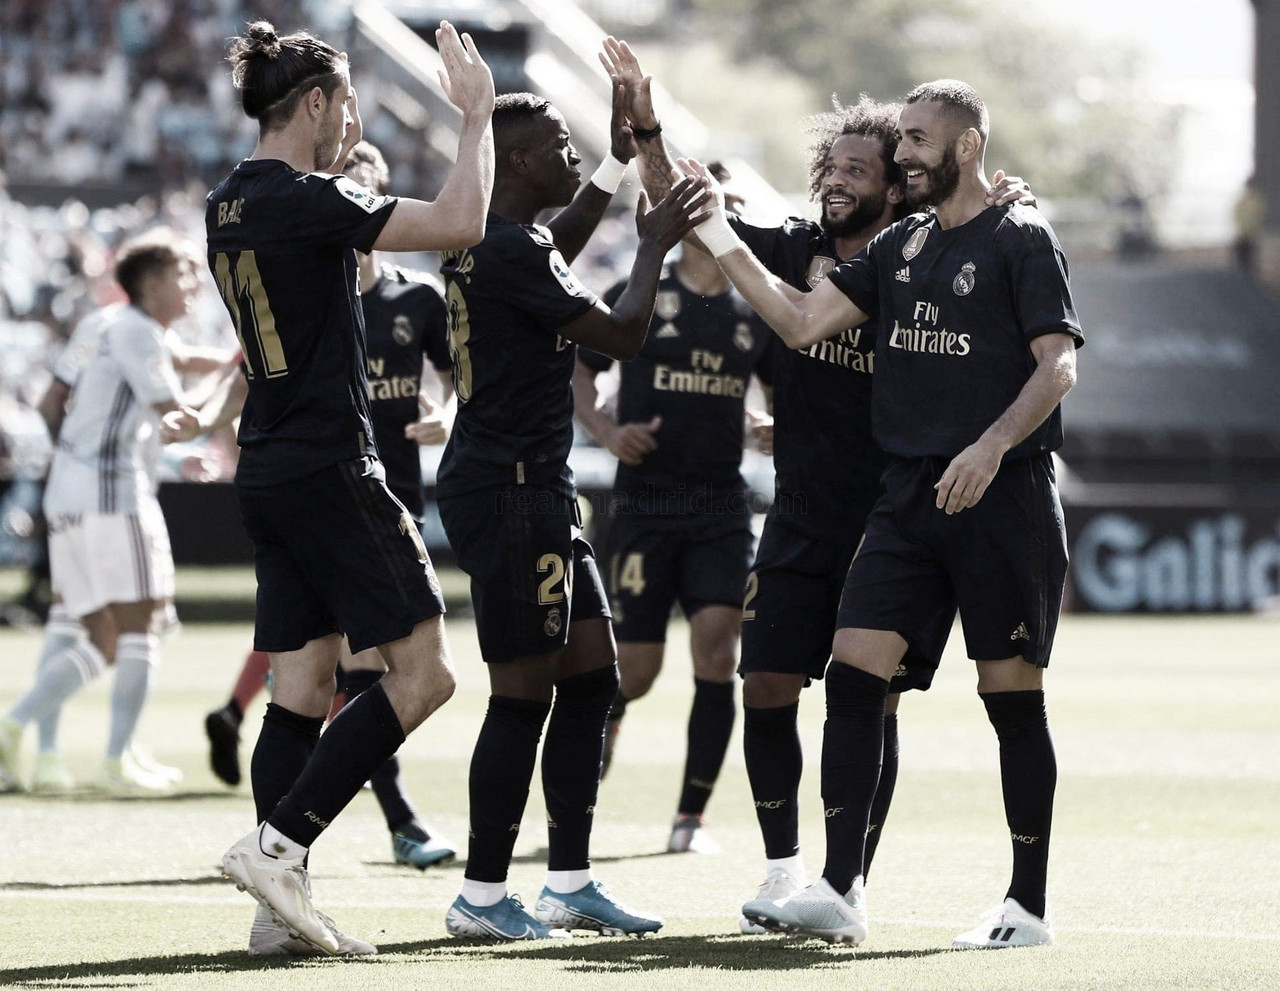 Previa PSG - Real Madrid: primer paso hacia la cima europea